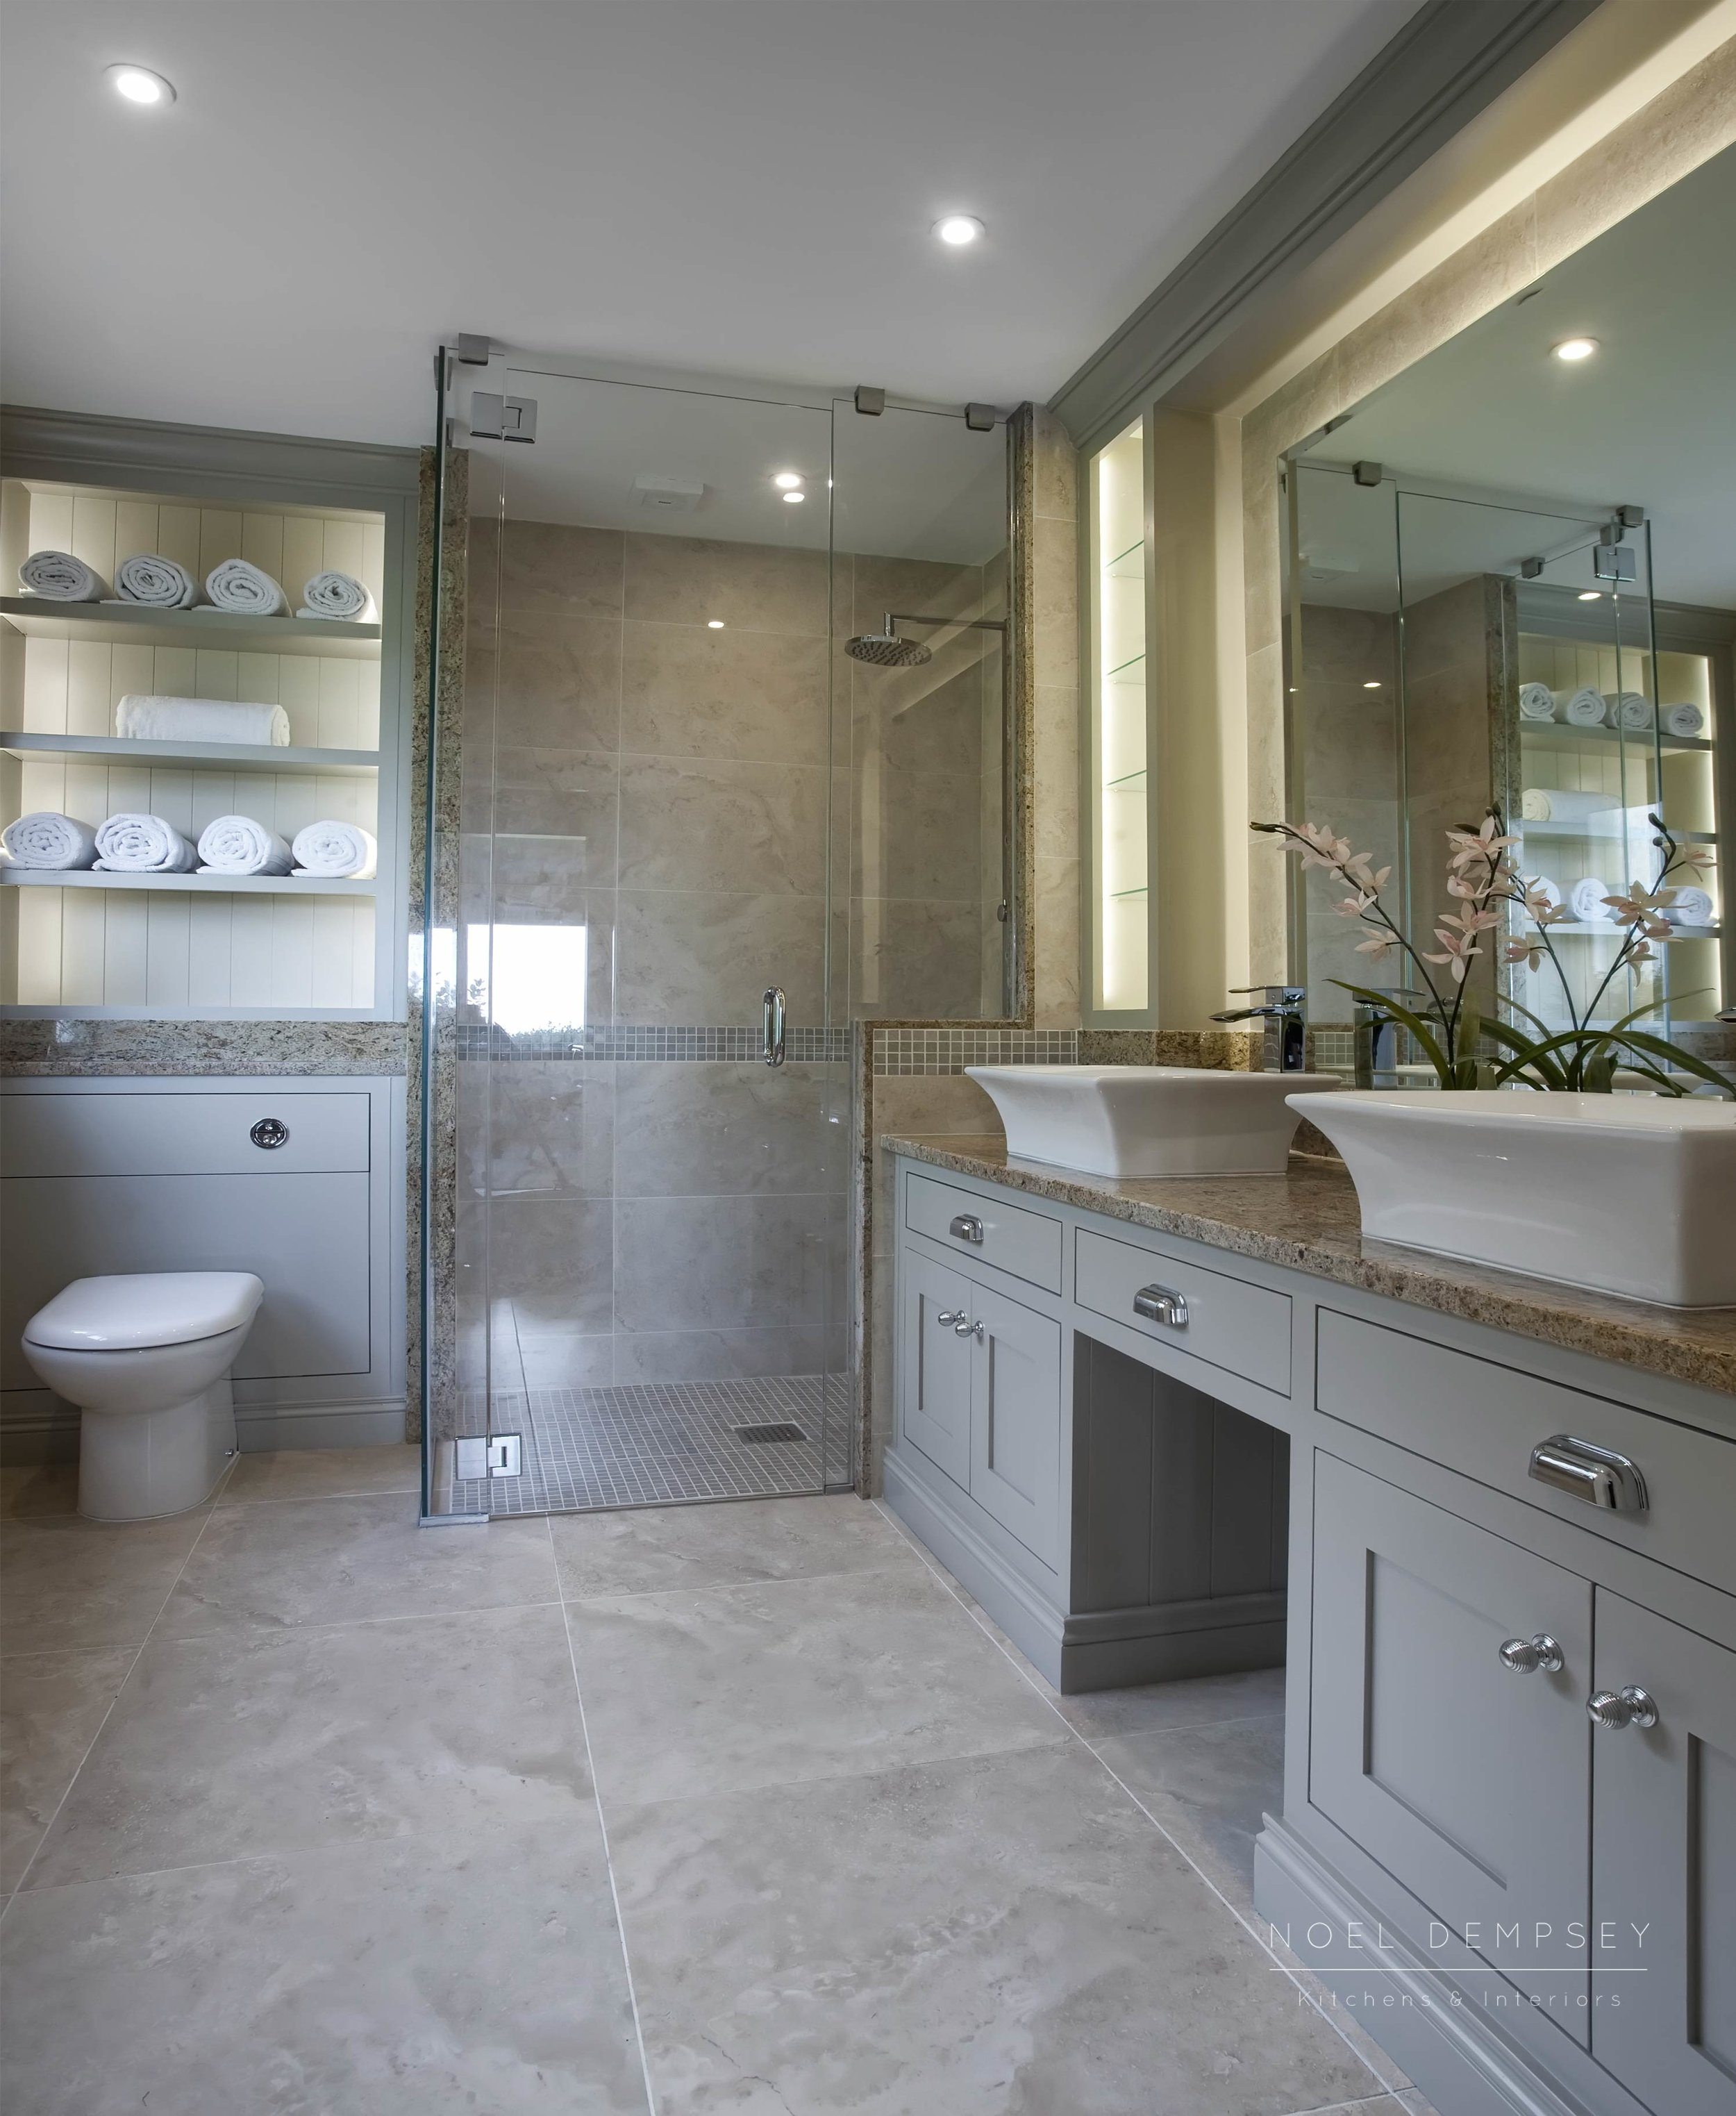 Bespoke Luxury Furniture - Noel Dempsey Design